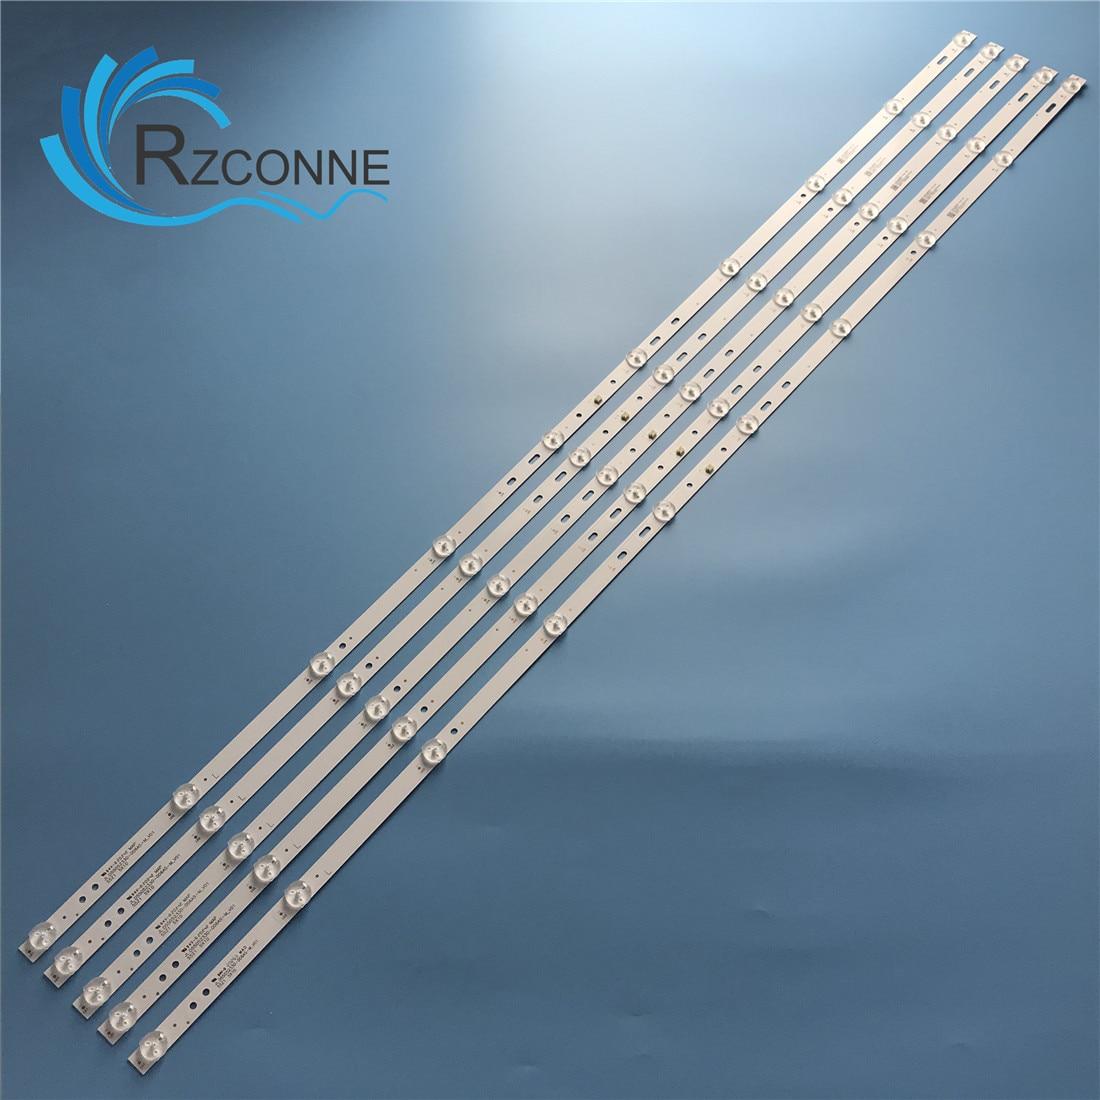 1077mm-de-tira-de-led-para-iluminacion-trasera-10-lampara-para-jld55052330-006as-m_v01-55z1